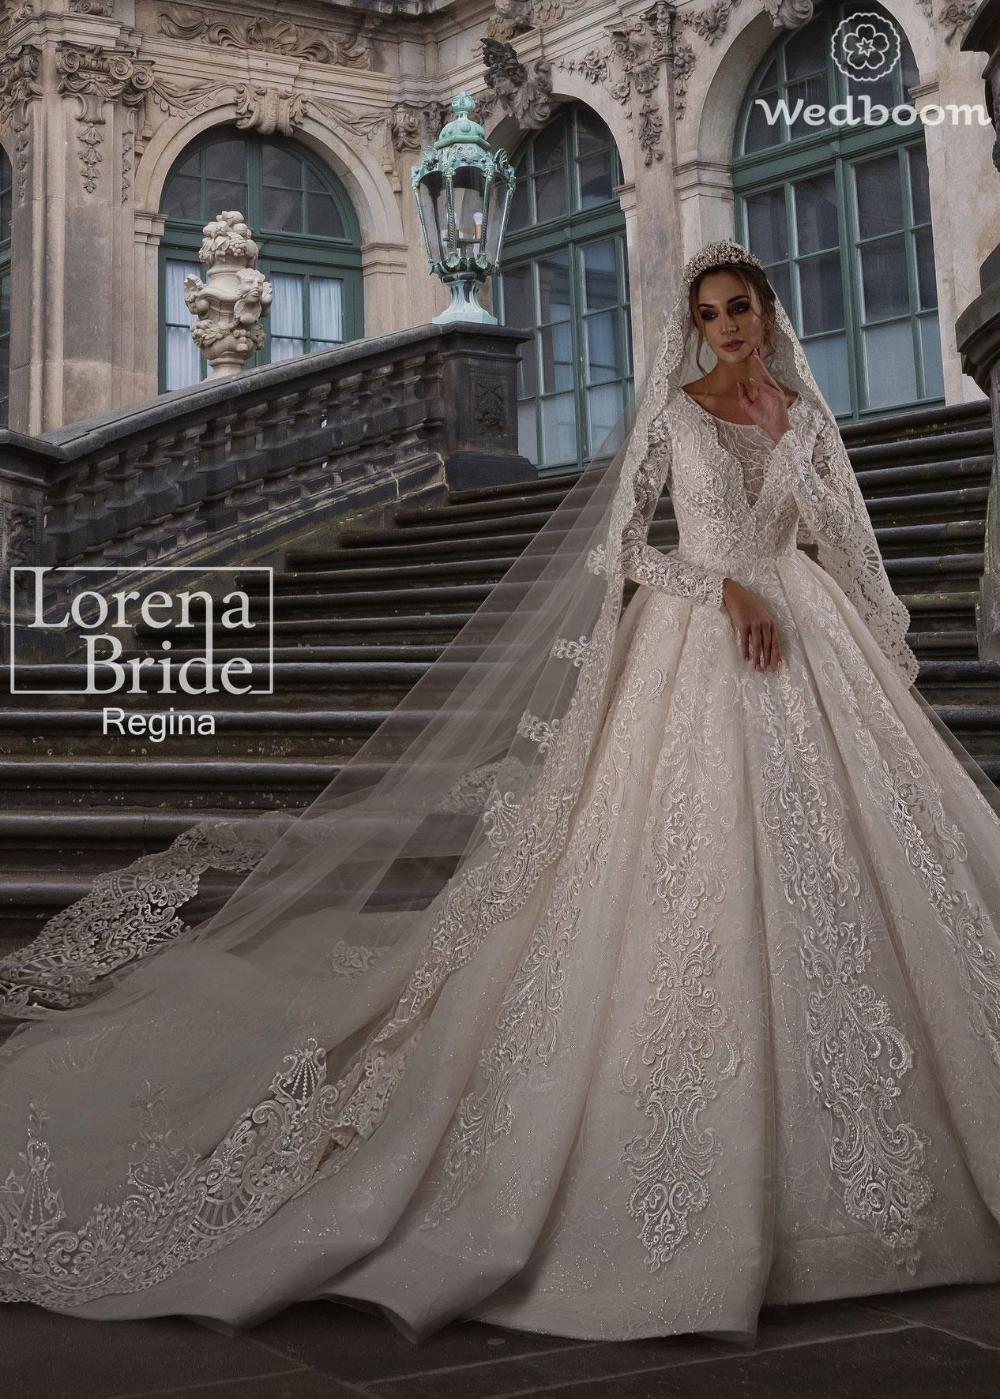 Wedding Dress Lorena Bride Regina Wedboom Eu Online Store In 2020 Wedding Dresses High Neck Wedding Dress Dresses